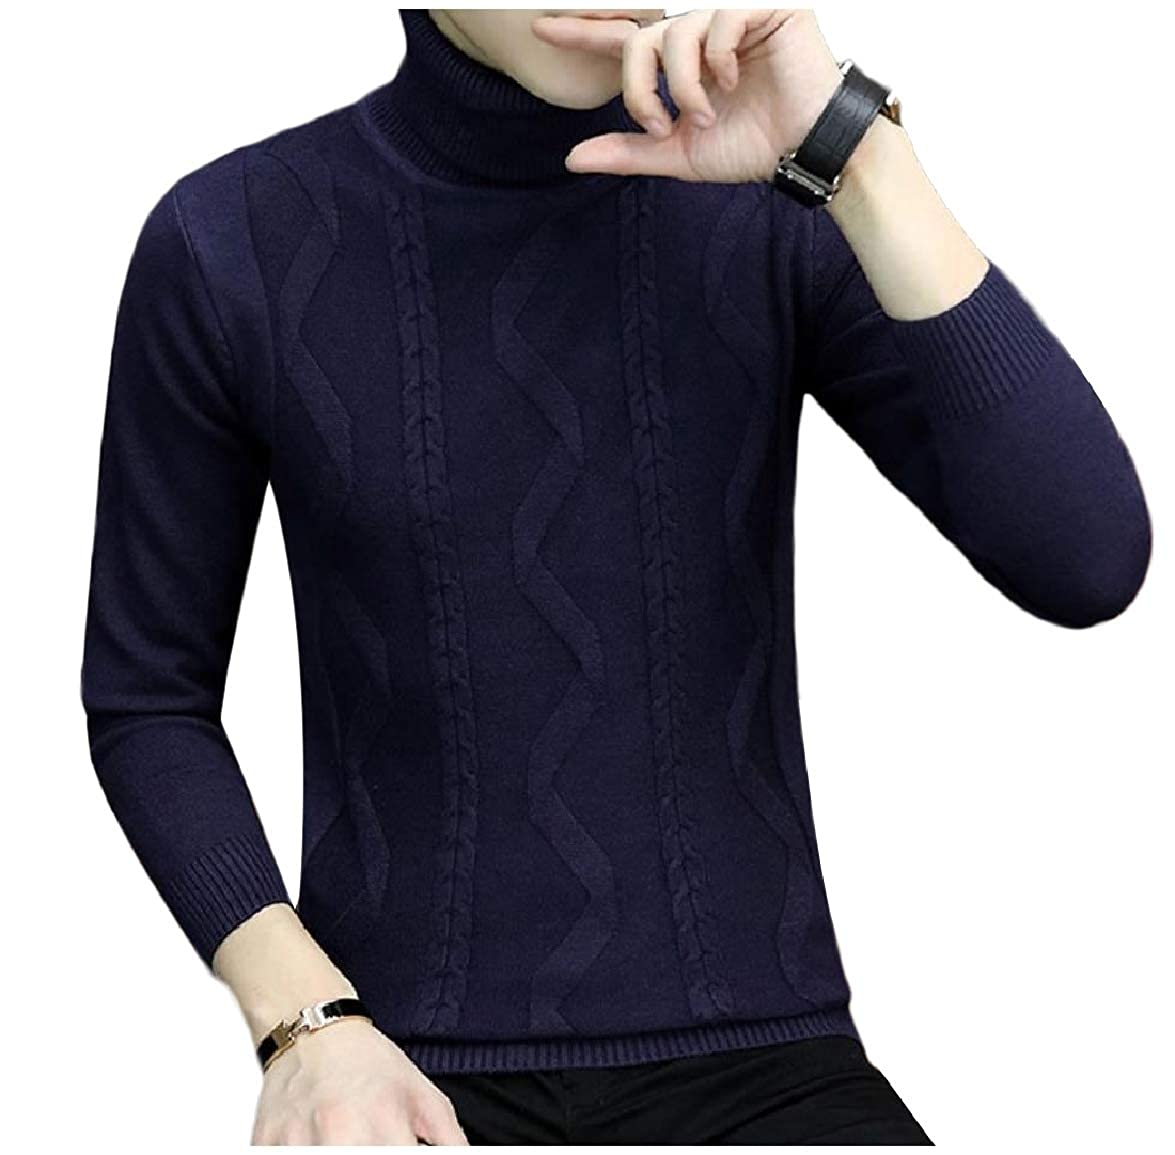 Abetteric Men High Waist Woven Pure Color Classic Rib Cozy Pullover Sweater